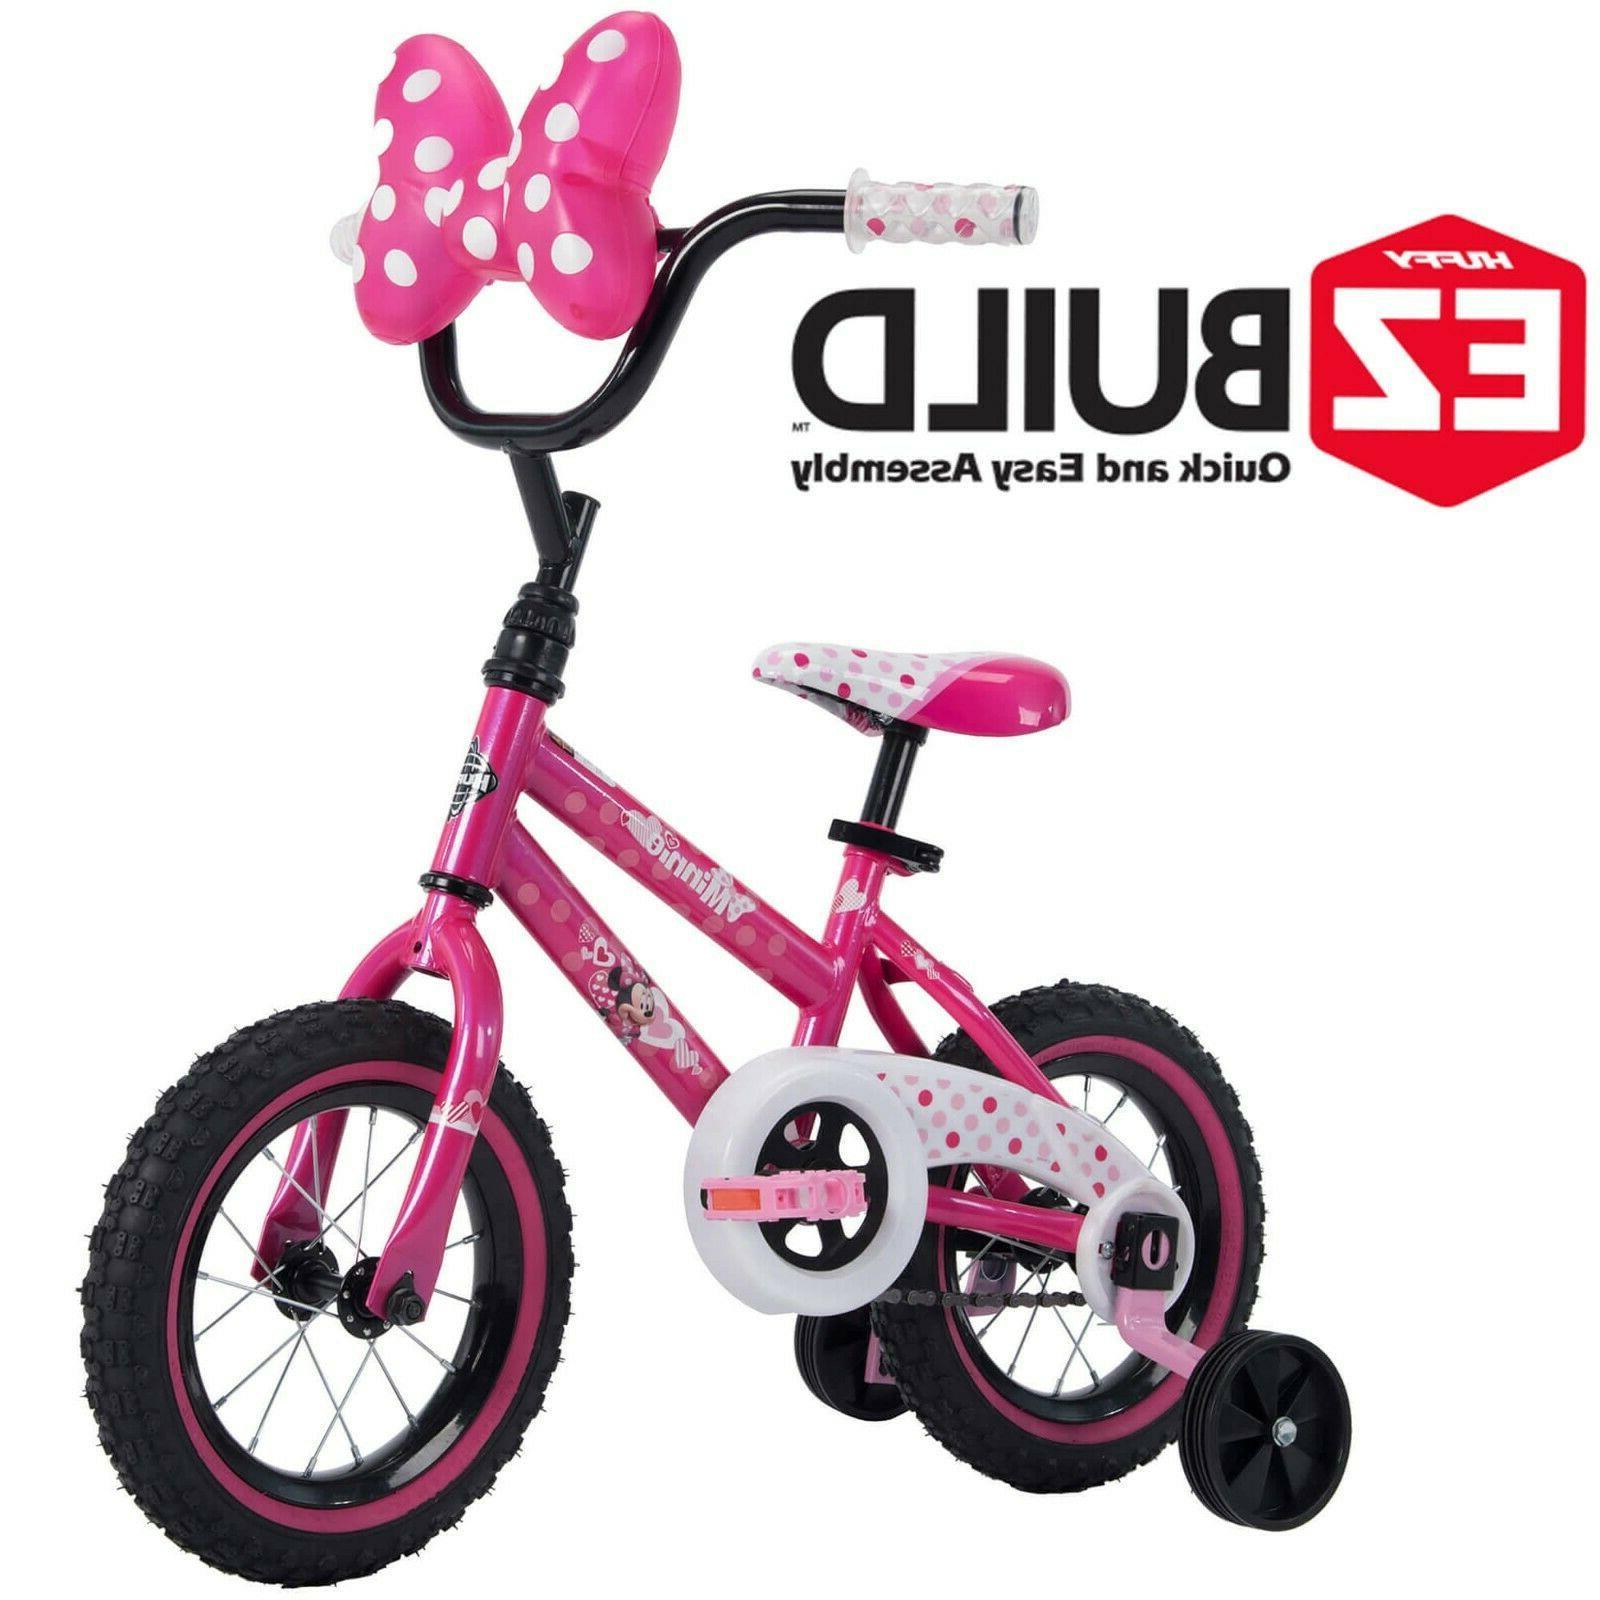 "Disney Minnie 12"" Girls' EZ Build Pink Bike, with wide t"